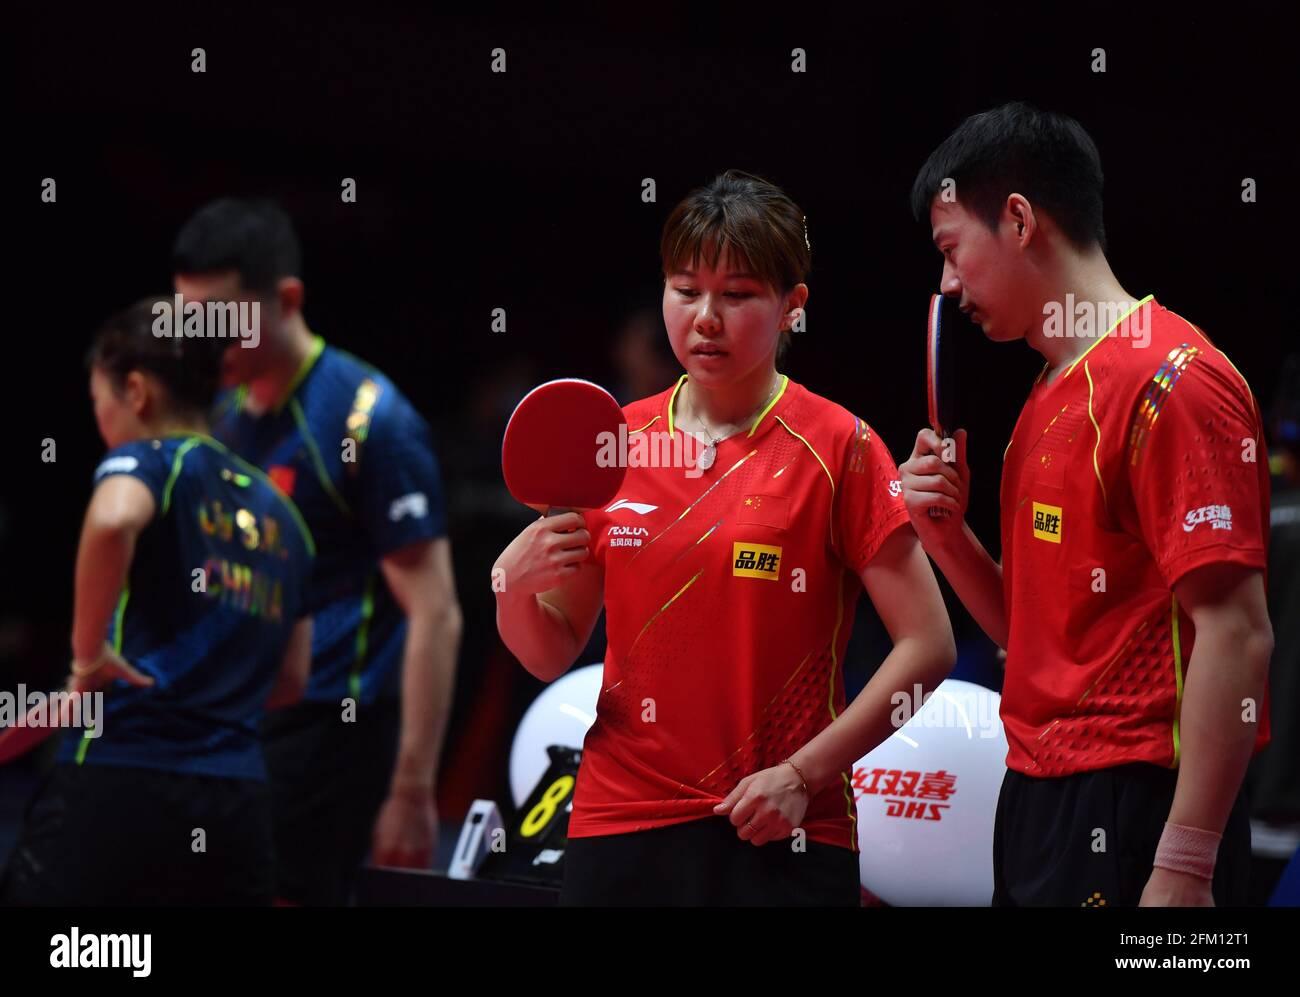 Xinxiang, province chinoise du Henan. 5 mai 2021. Zhou Yu (1er R)/Chen Xingtong (2e R) communiquent lors du quart de finale mixte de doubles entre Xu Xin/Liu Shiwen et Zhou Yu/Chen Xingtong lors des essais de Grand smashes de WTT (World Table tennis) de 2021 et de la simulation olympique à Xinxiang, dans la province de Henan, en Chine centrale, le 5 mai 2021. Credit: Li Jianan/Xinhua/Alamy Live News Banque D'Images